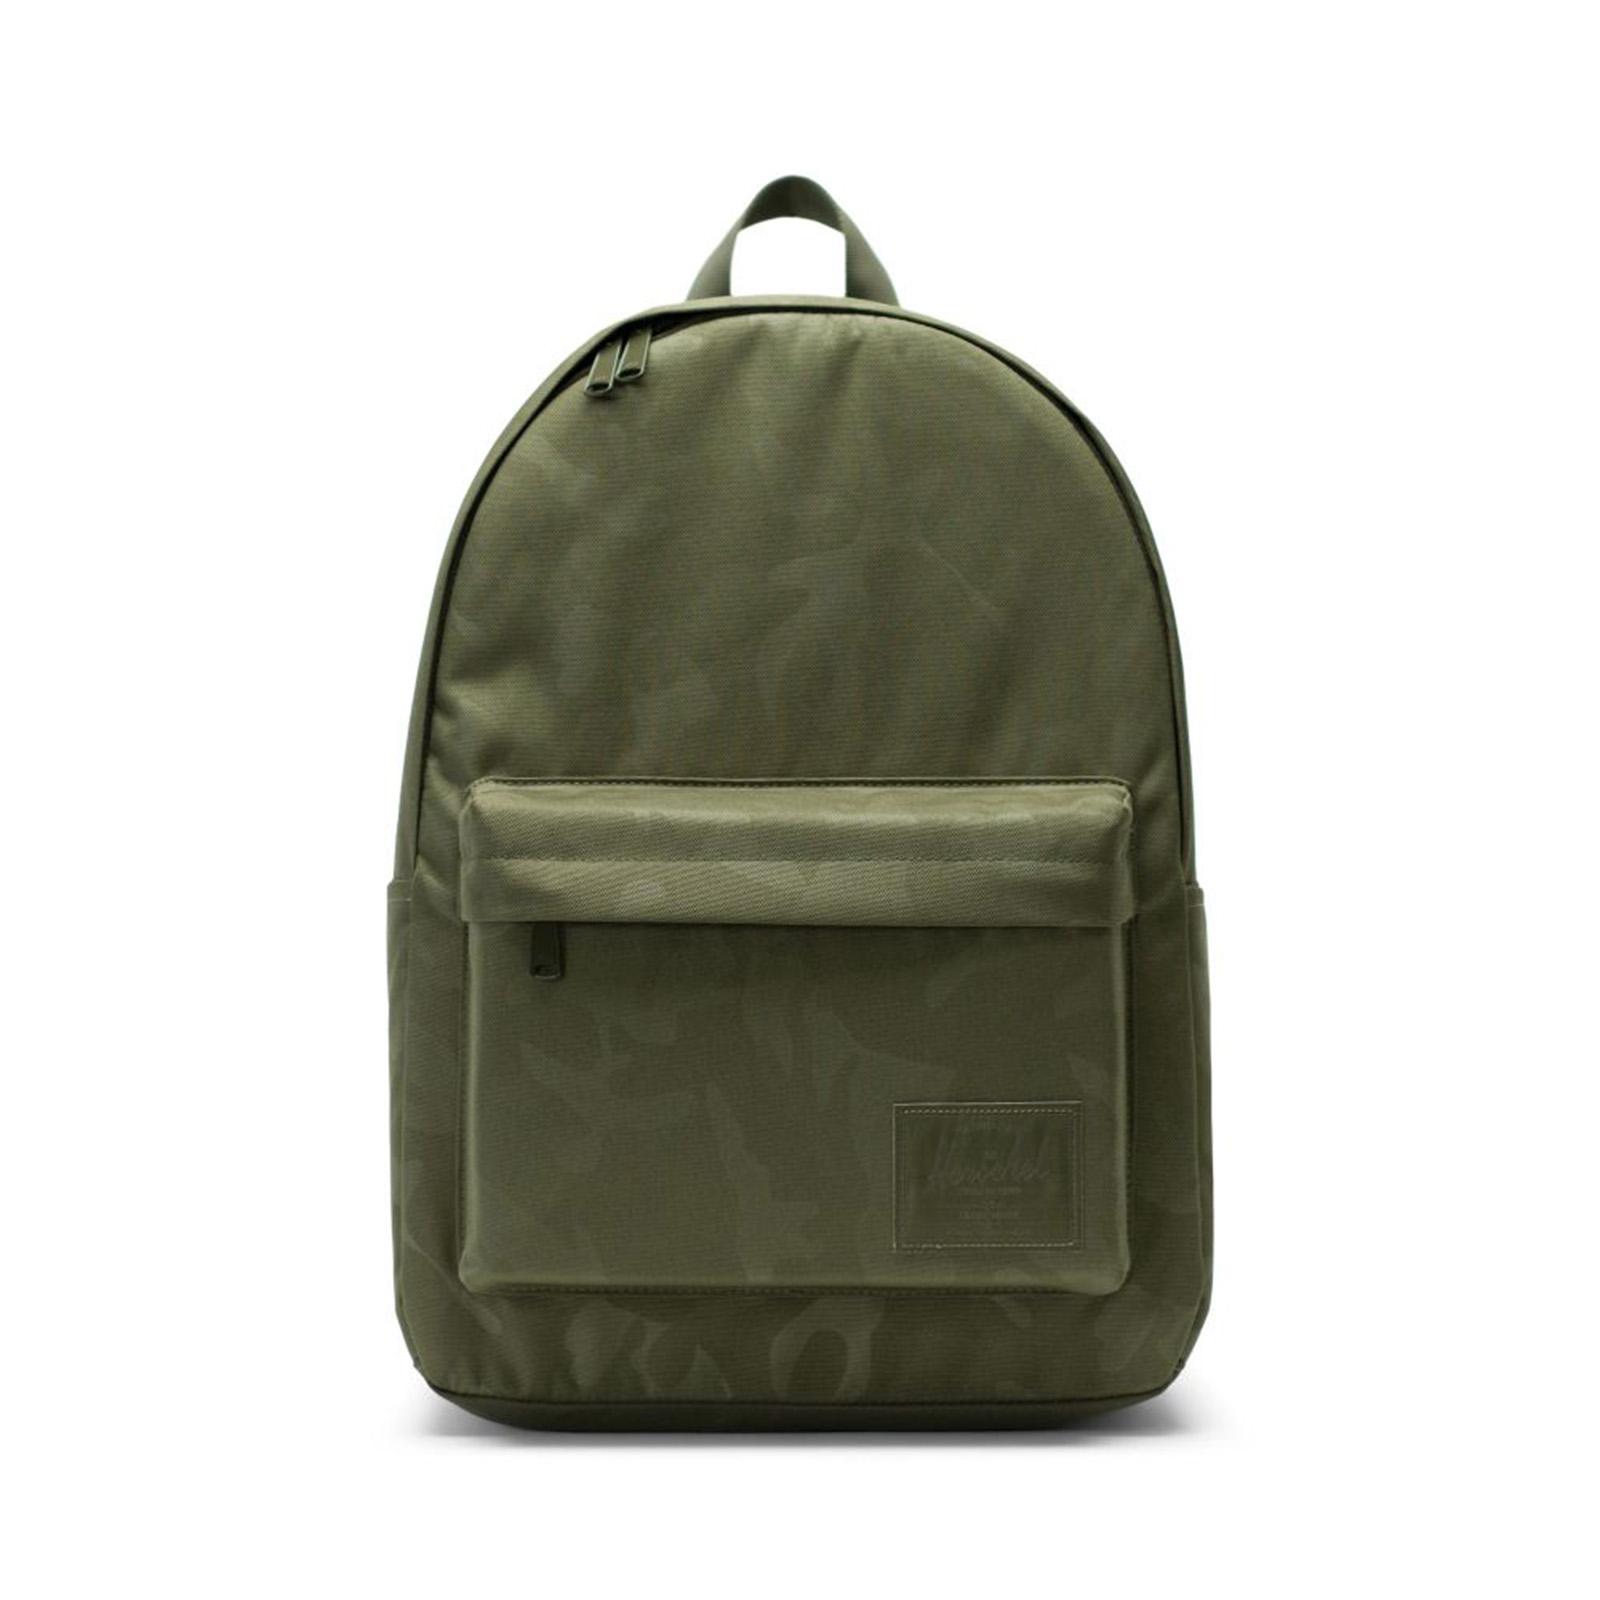 27273f6951 Herschel Classic X-Large Olive Night Tonal Camo - Backpack Green